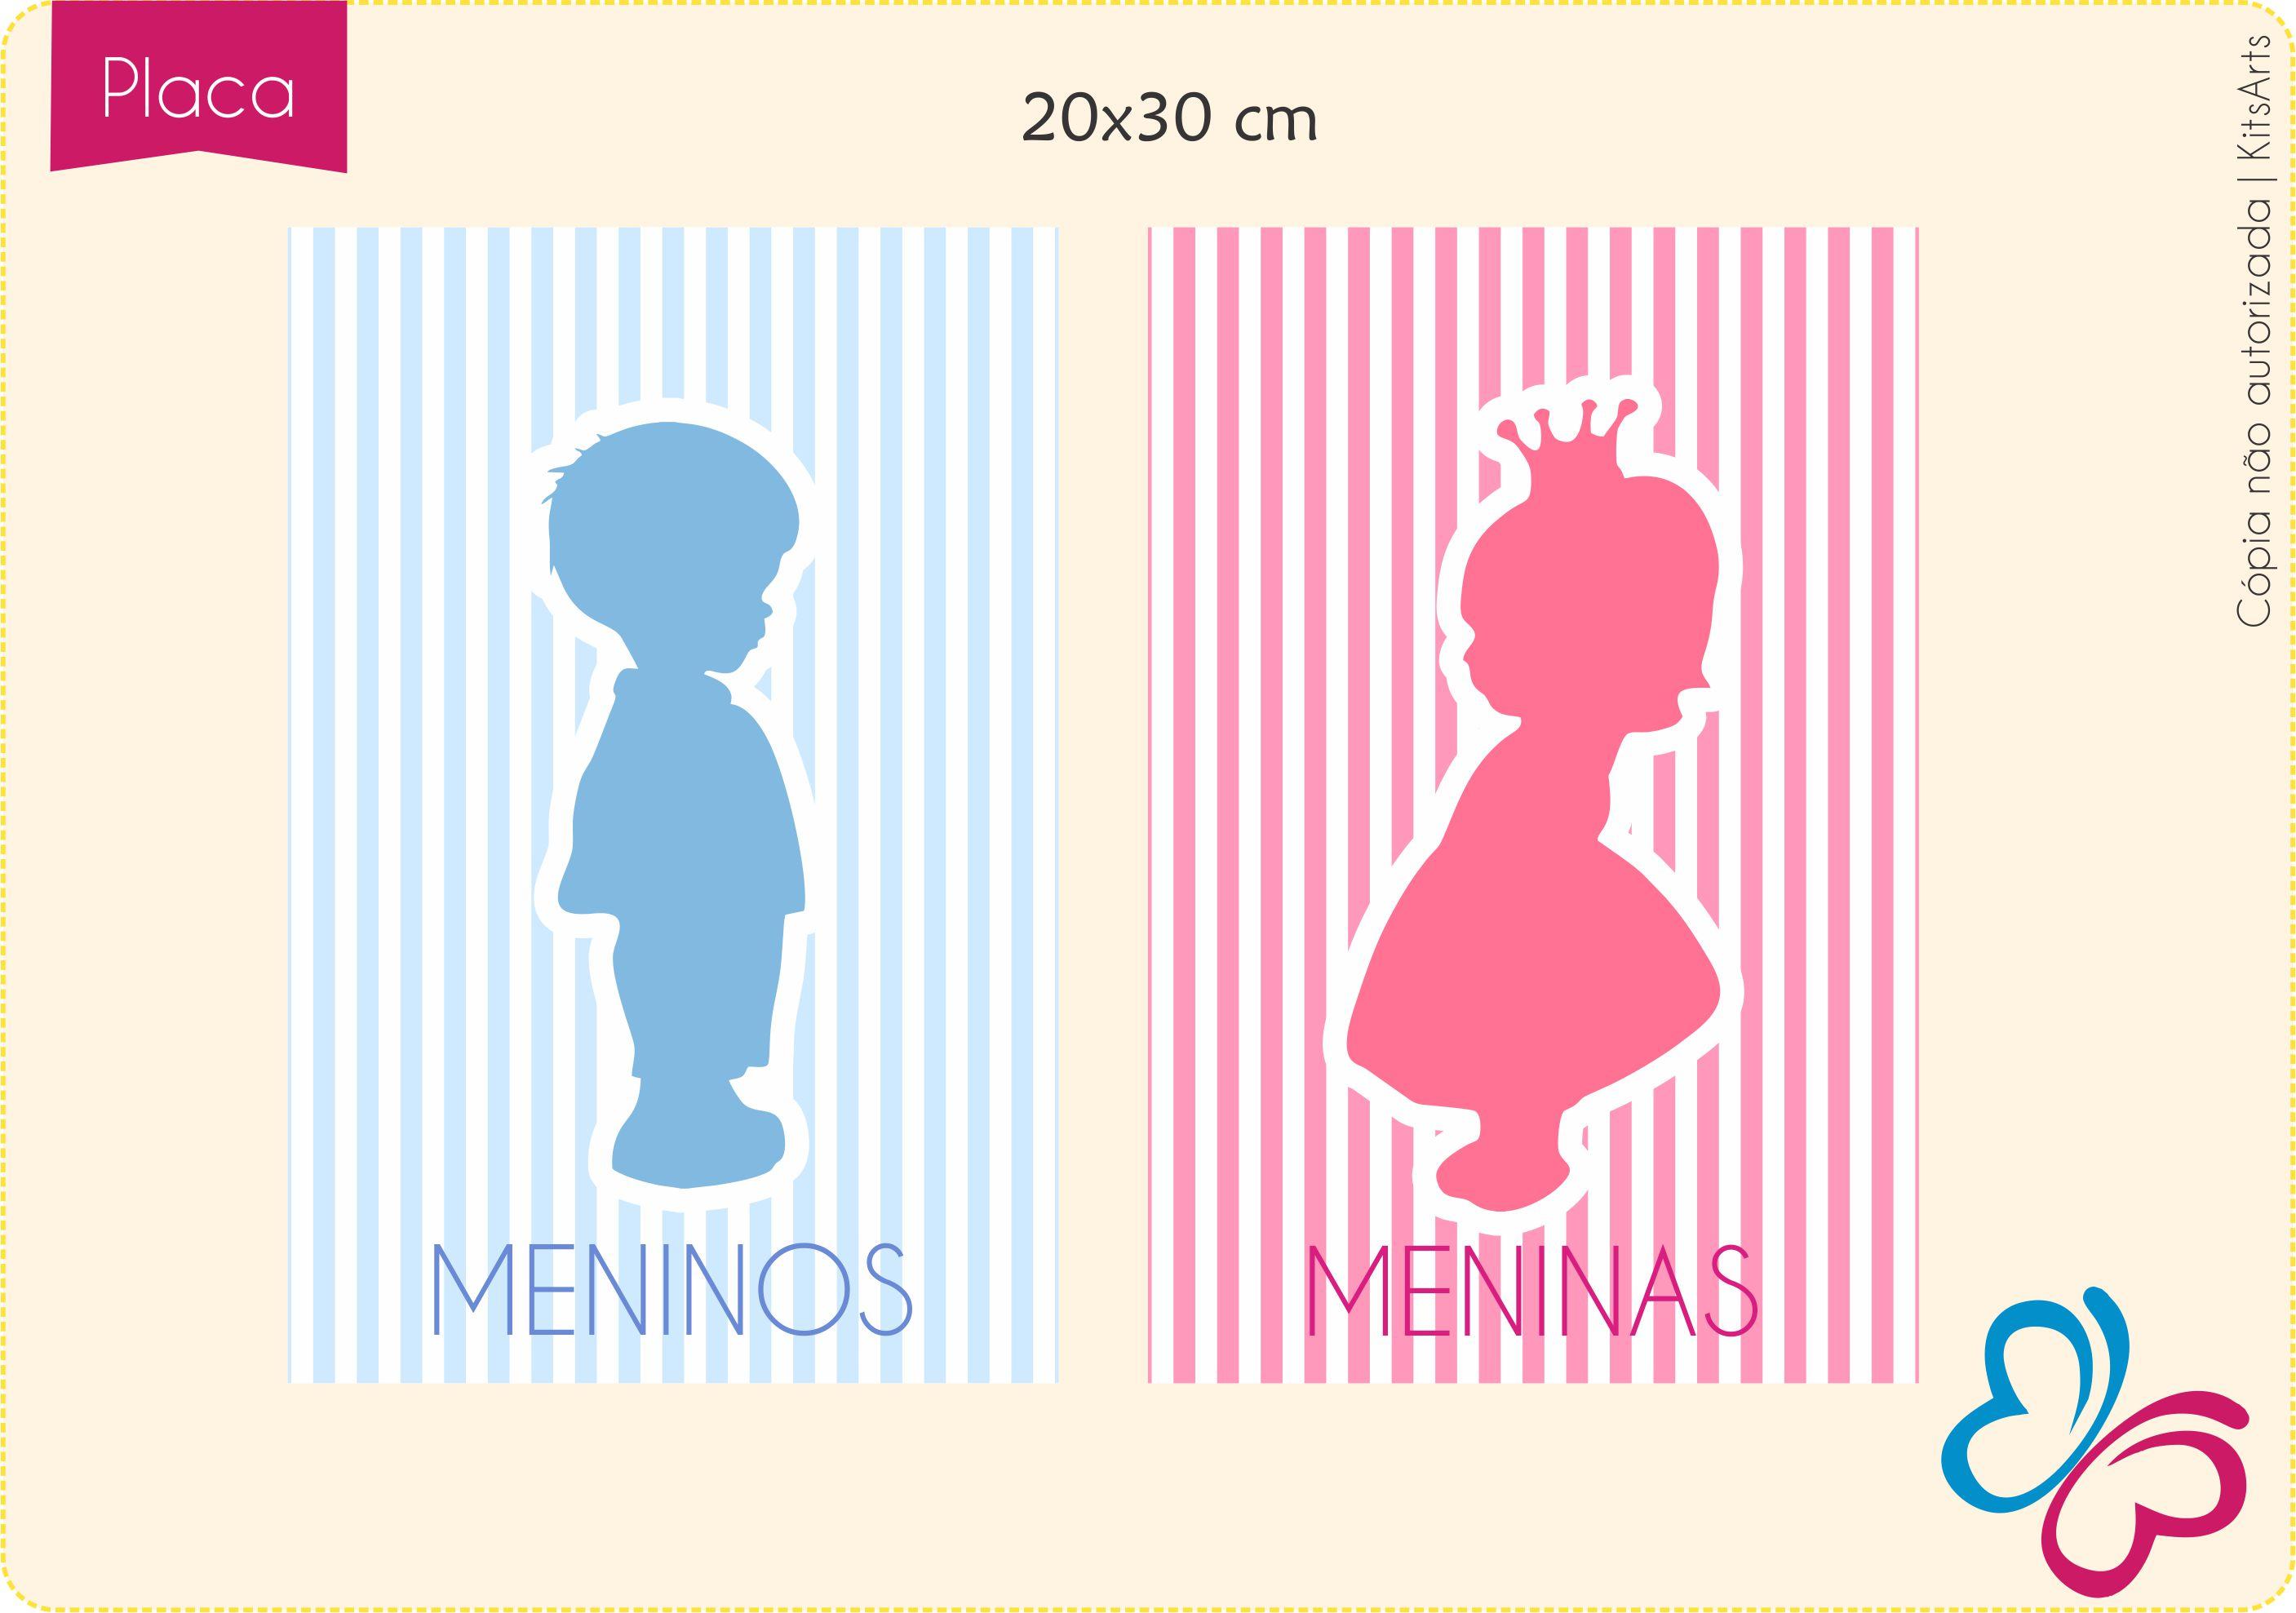 Arte Placa p/Banheiro  Princesa/Principe KitsArts Elo7 #C80346 2814 1977